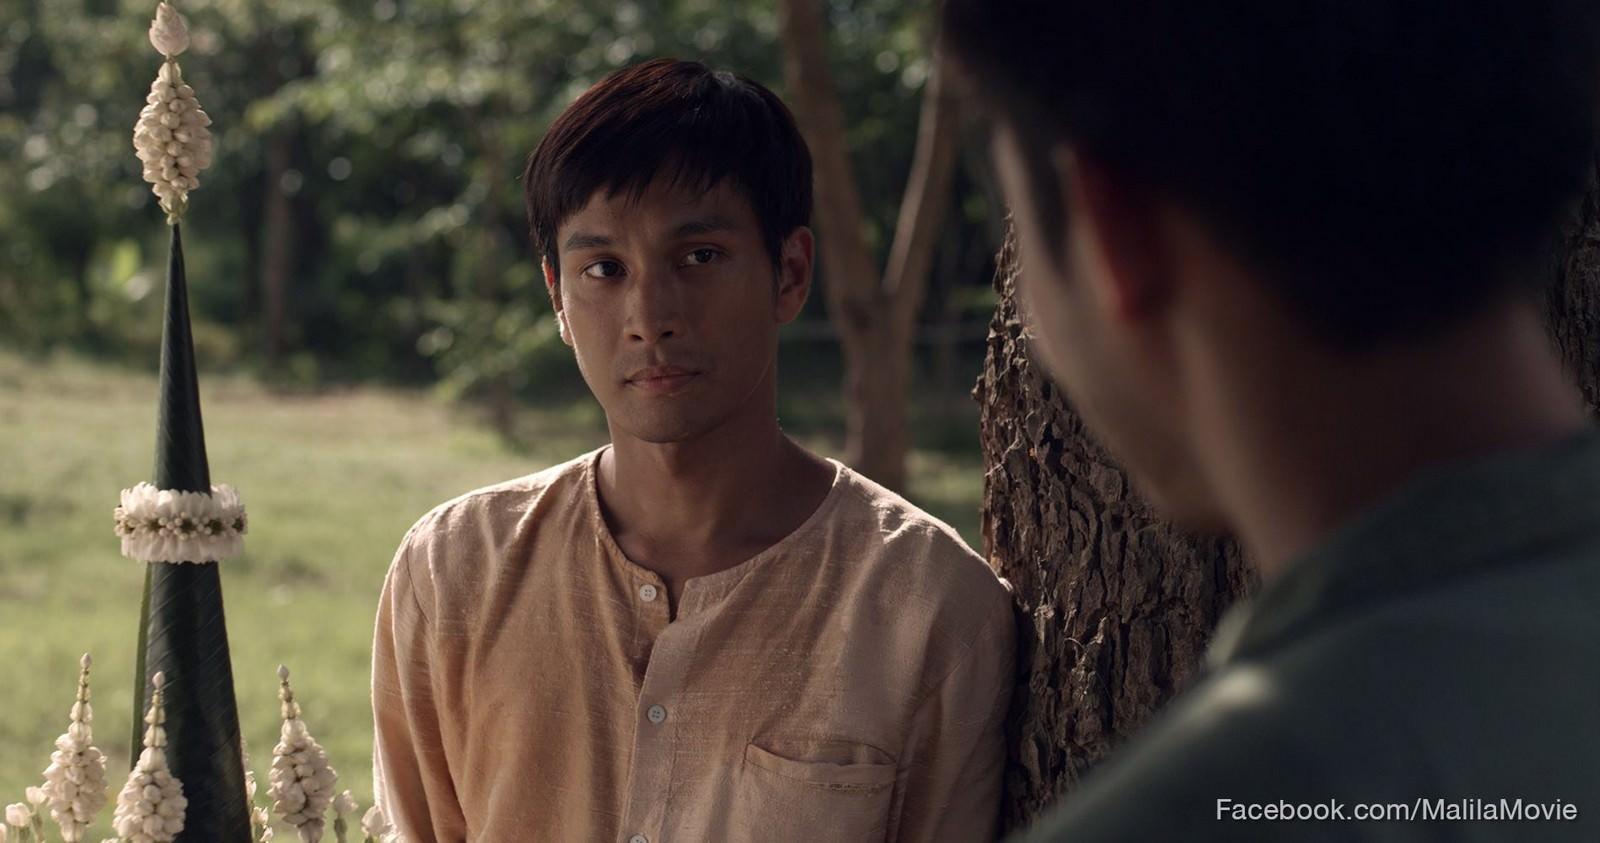 Movie, มะลิลา(泰國, 2017年) / 告別茉莉(台灣) / Malila: The Farewell Flower(英文), 電影劇照, 角色與演員介紹